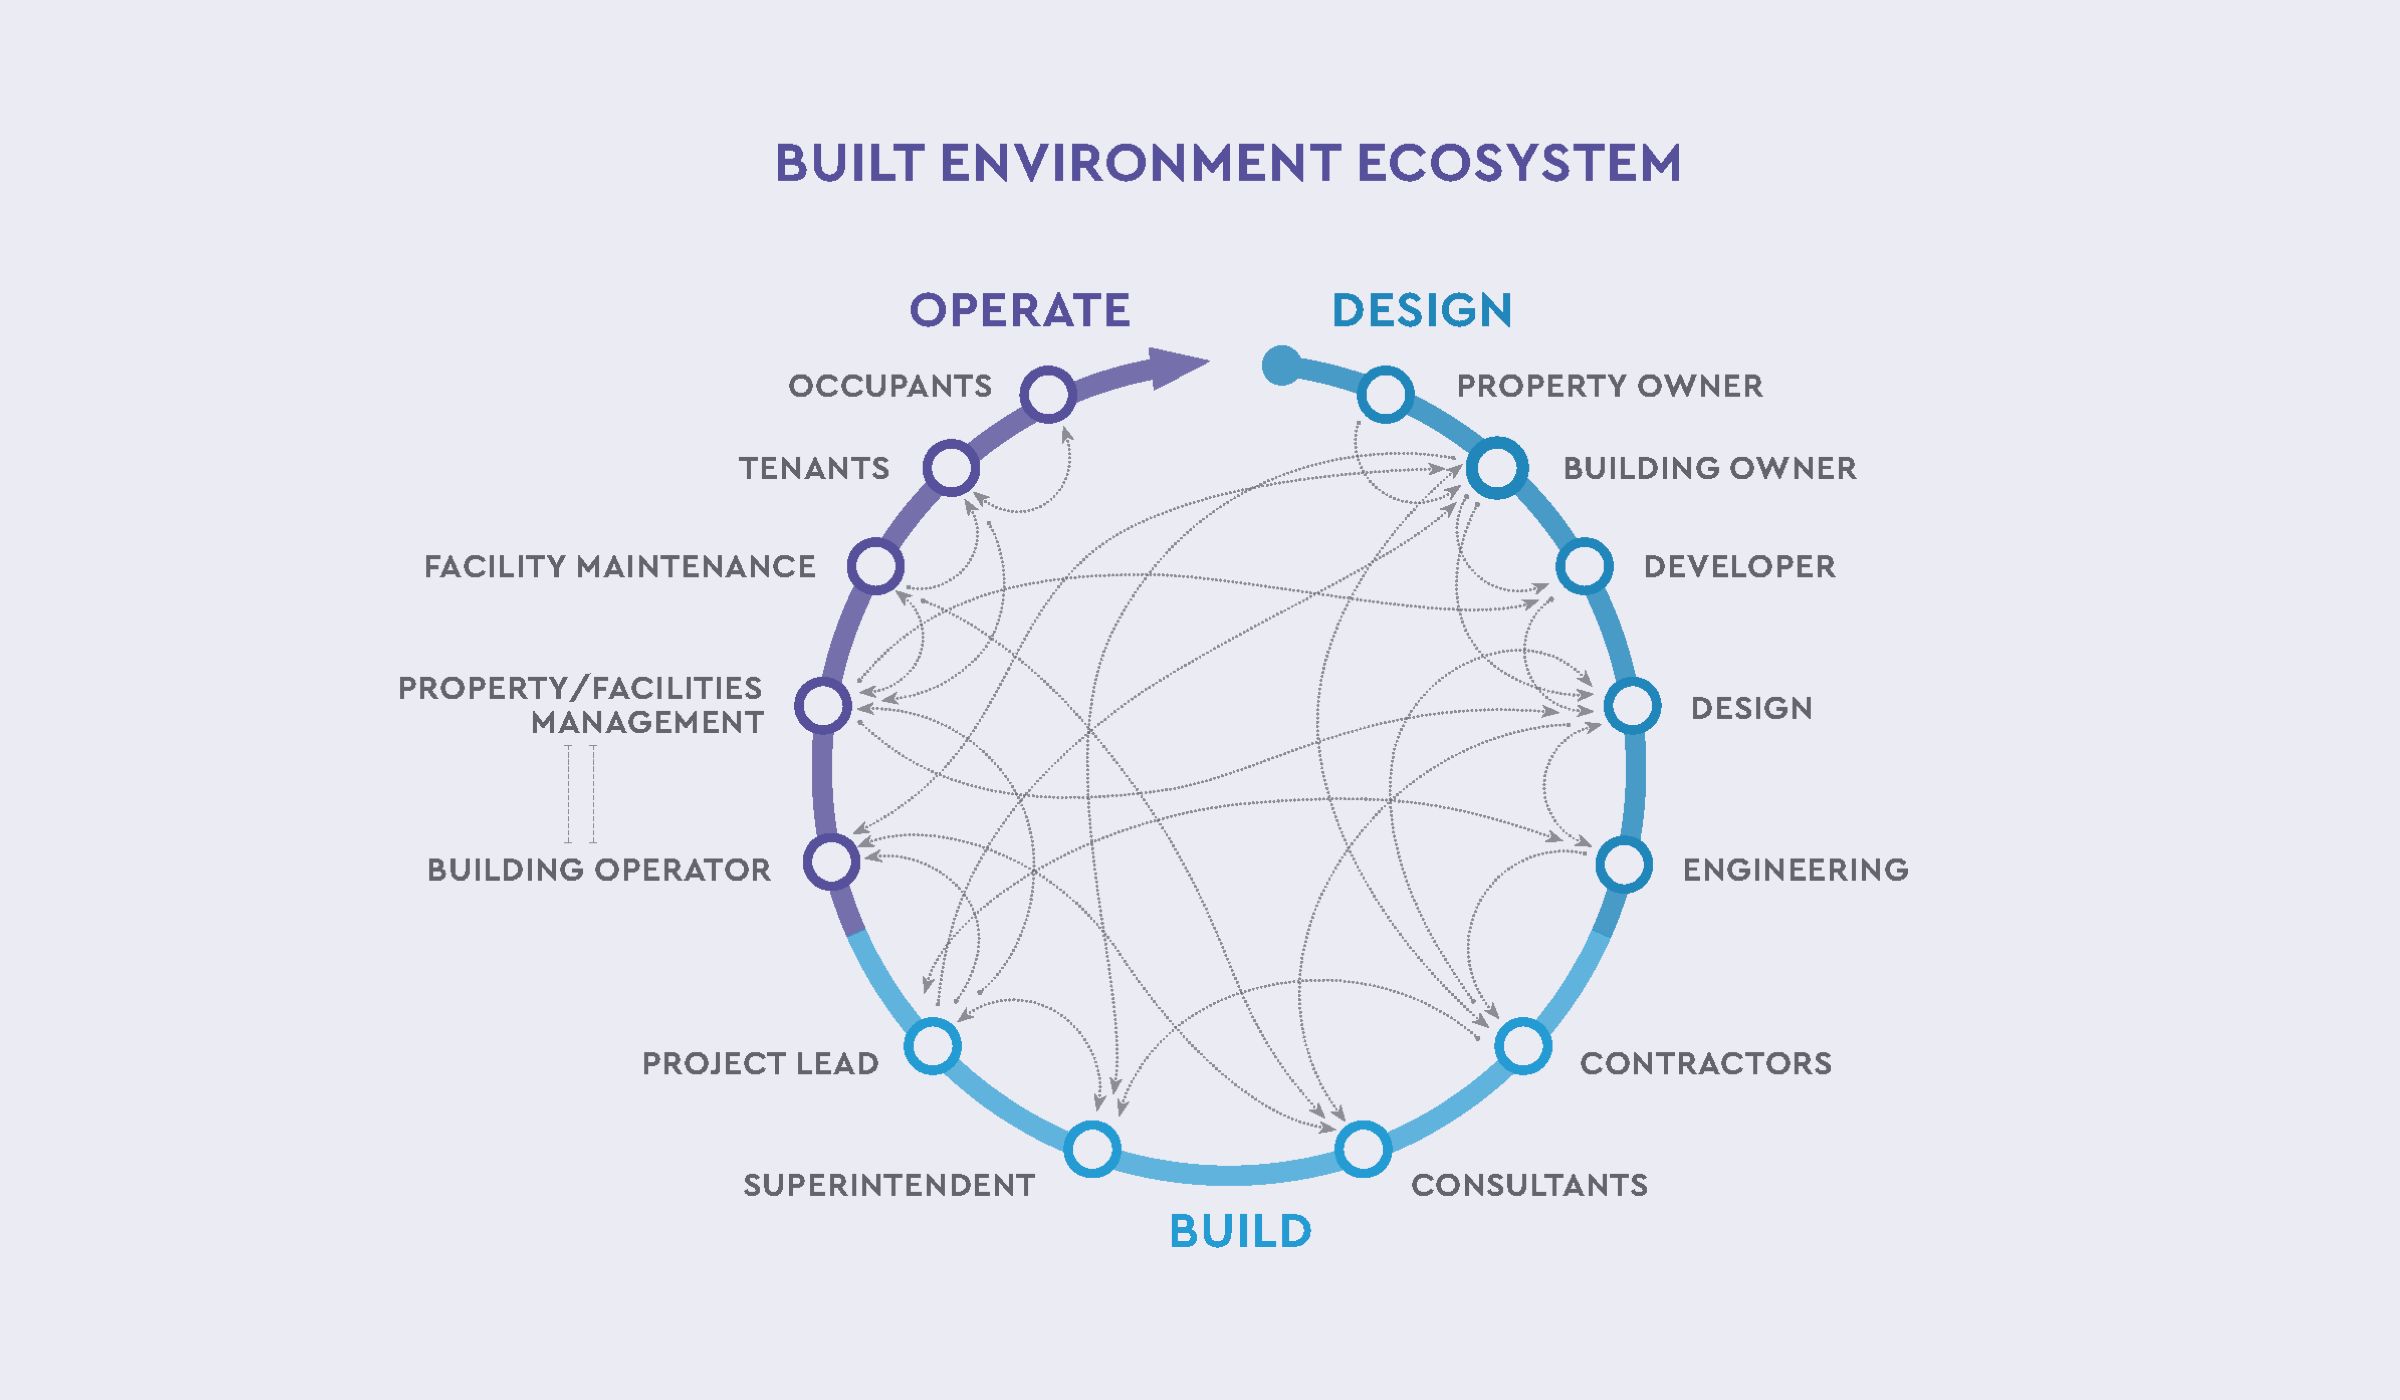 Building Development Players